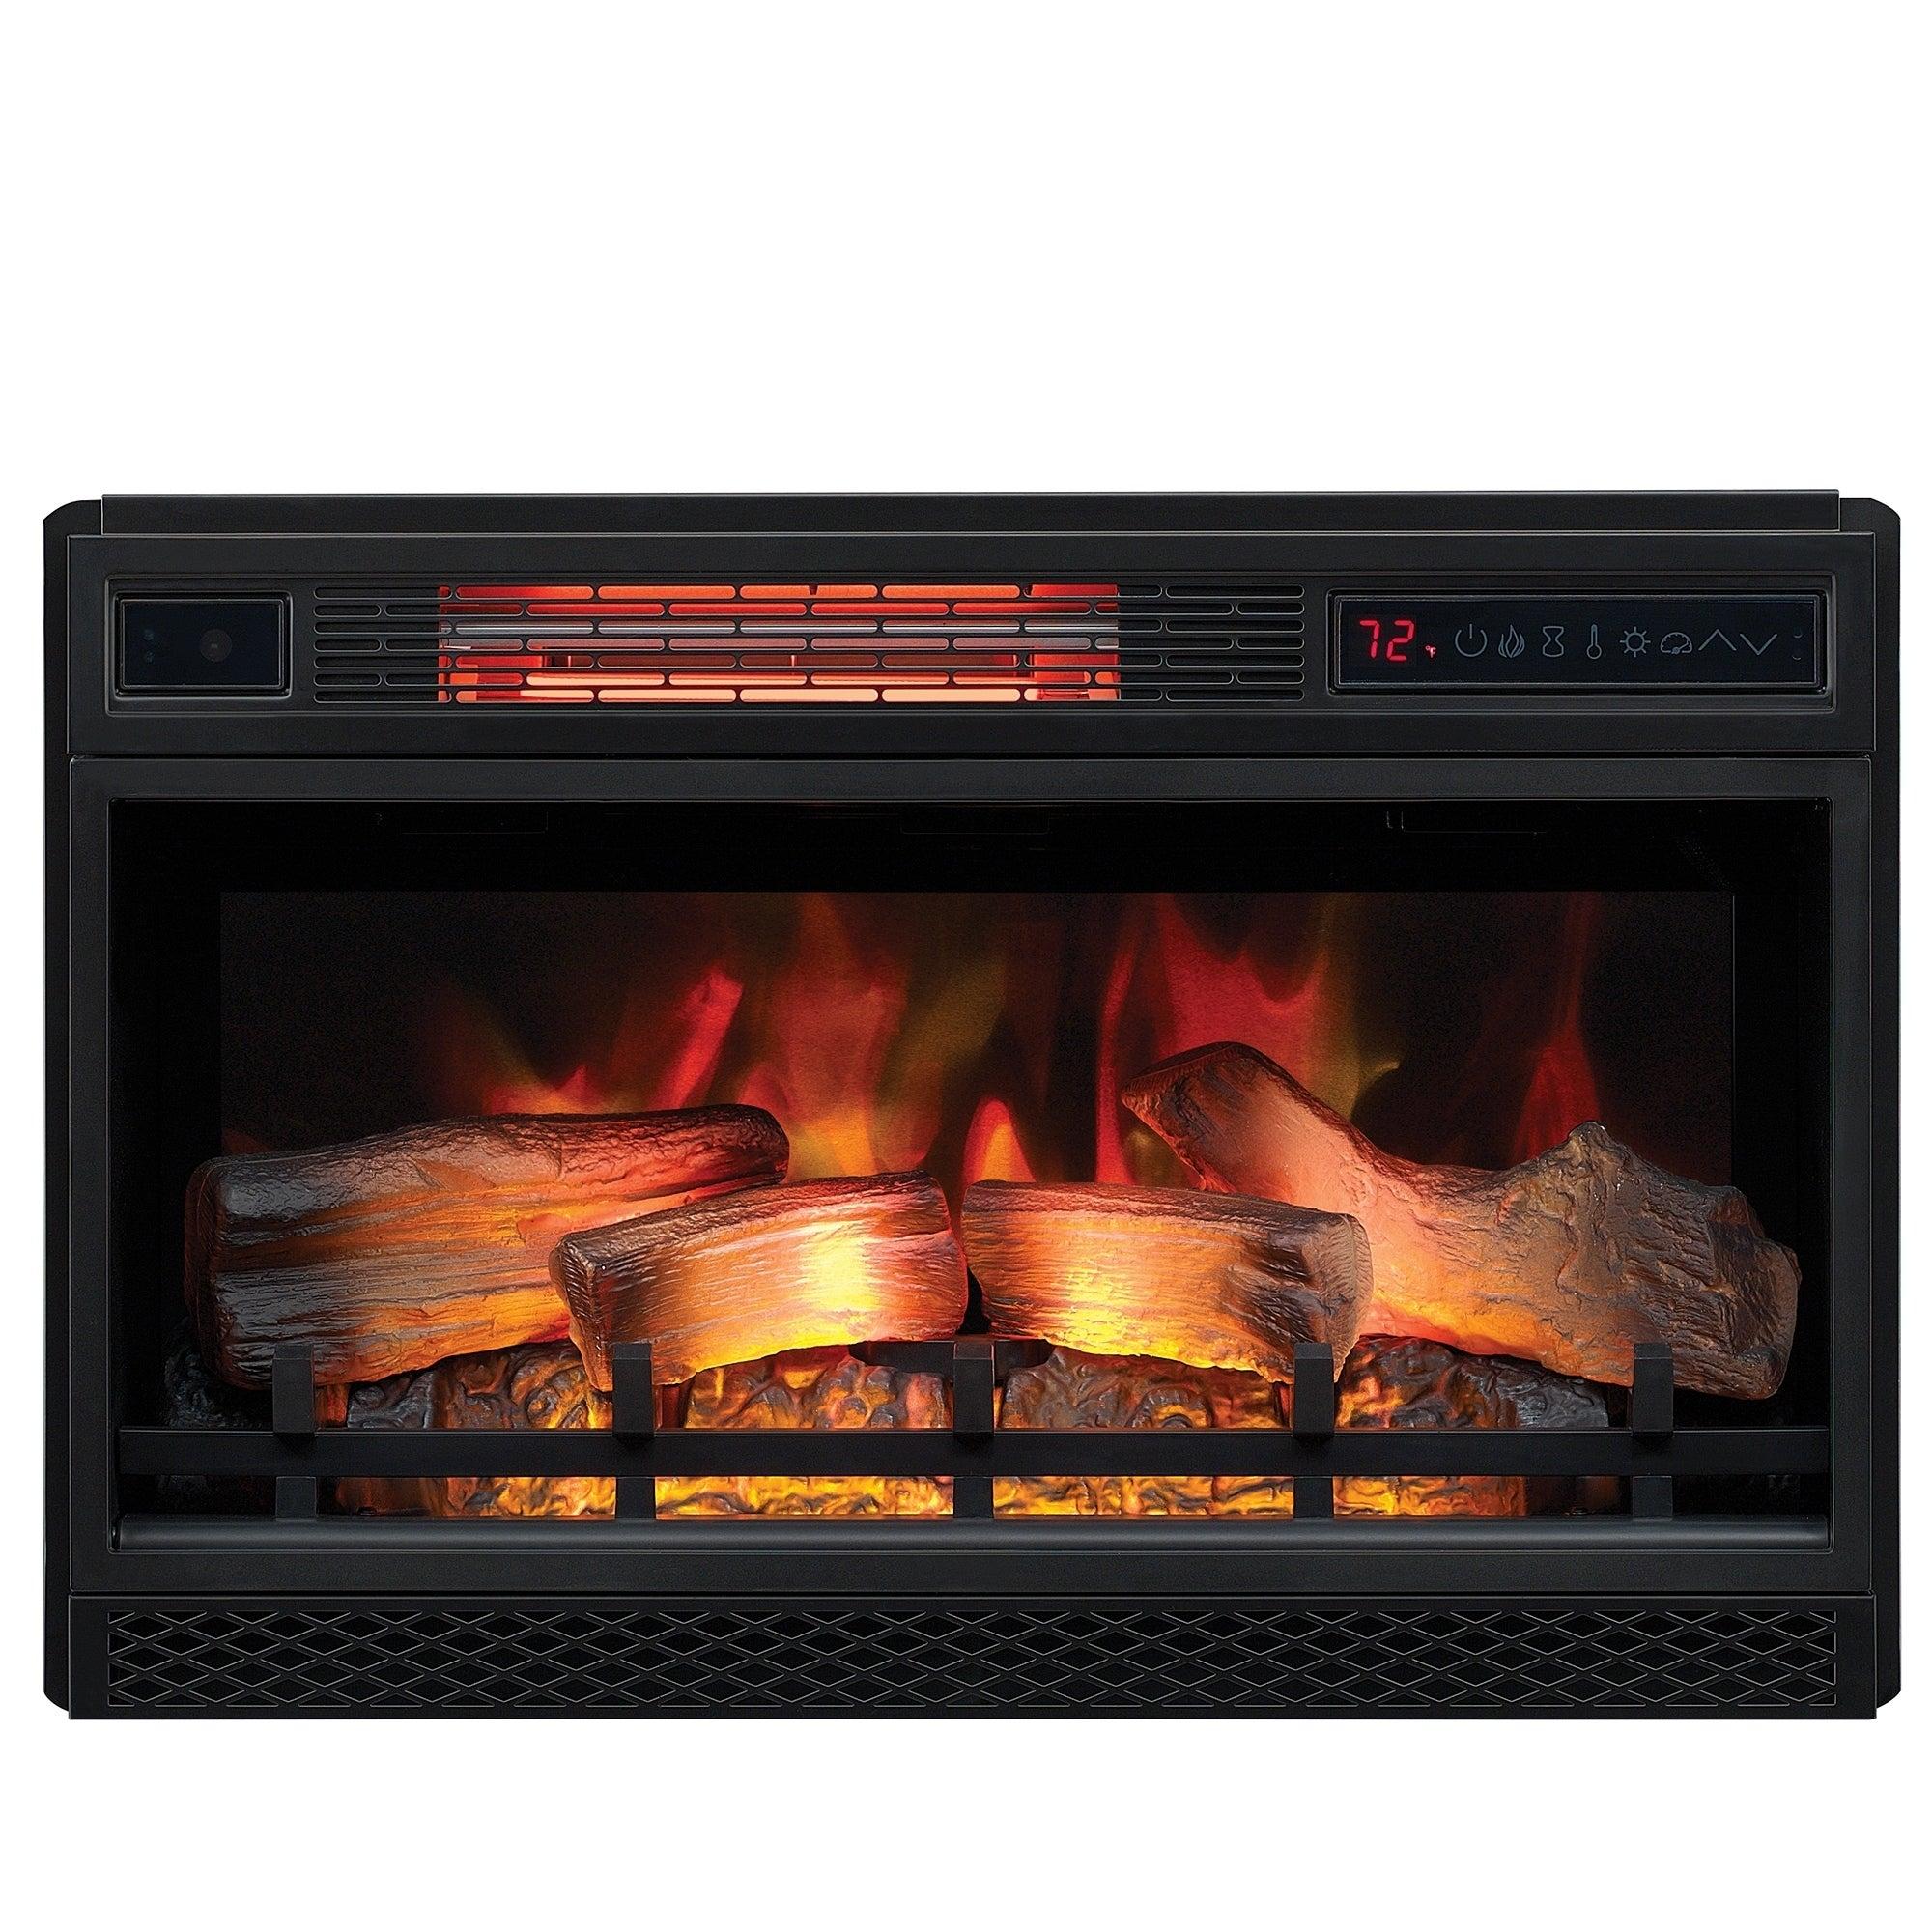 ClassicFlame 26 3D Infrared Quartz Electric Fireplace Insert 8528b73f 0afe 431a bfd7 22f5d3fc702d